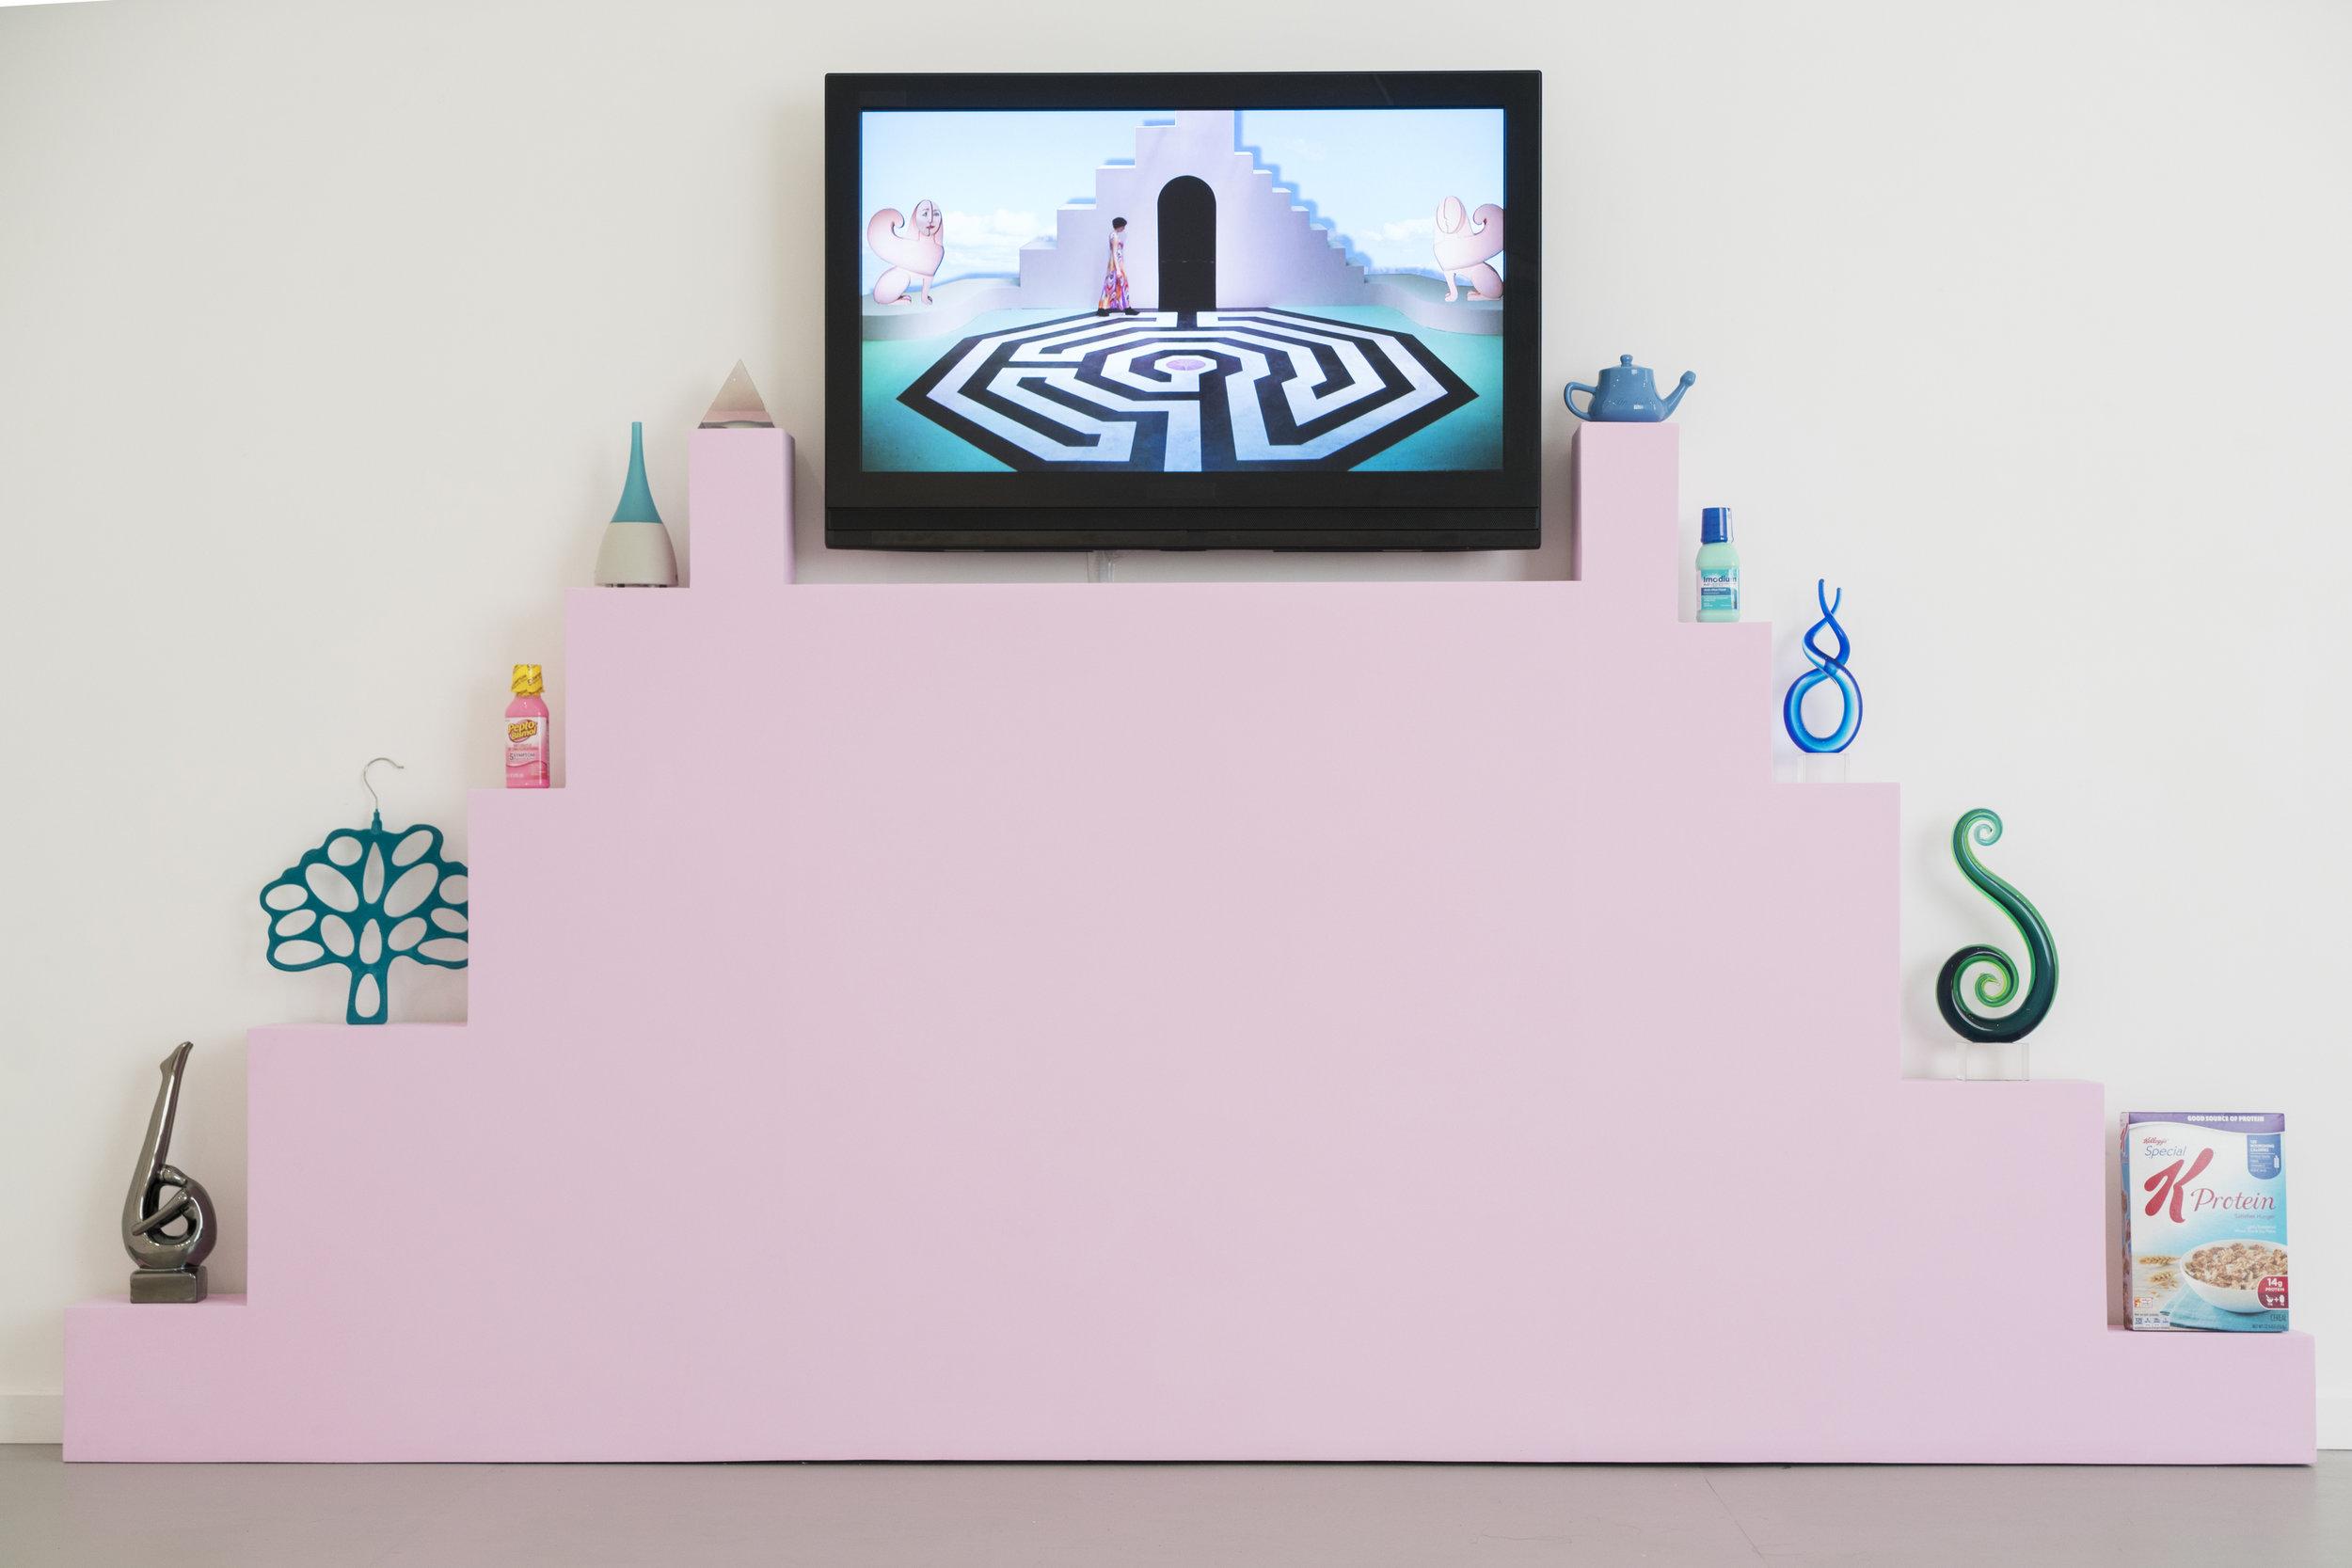 Shana Moulton  Every Angle is an Angel , 2016. Digital Video, 6m19s, wood, house paint, sourced objects.